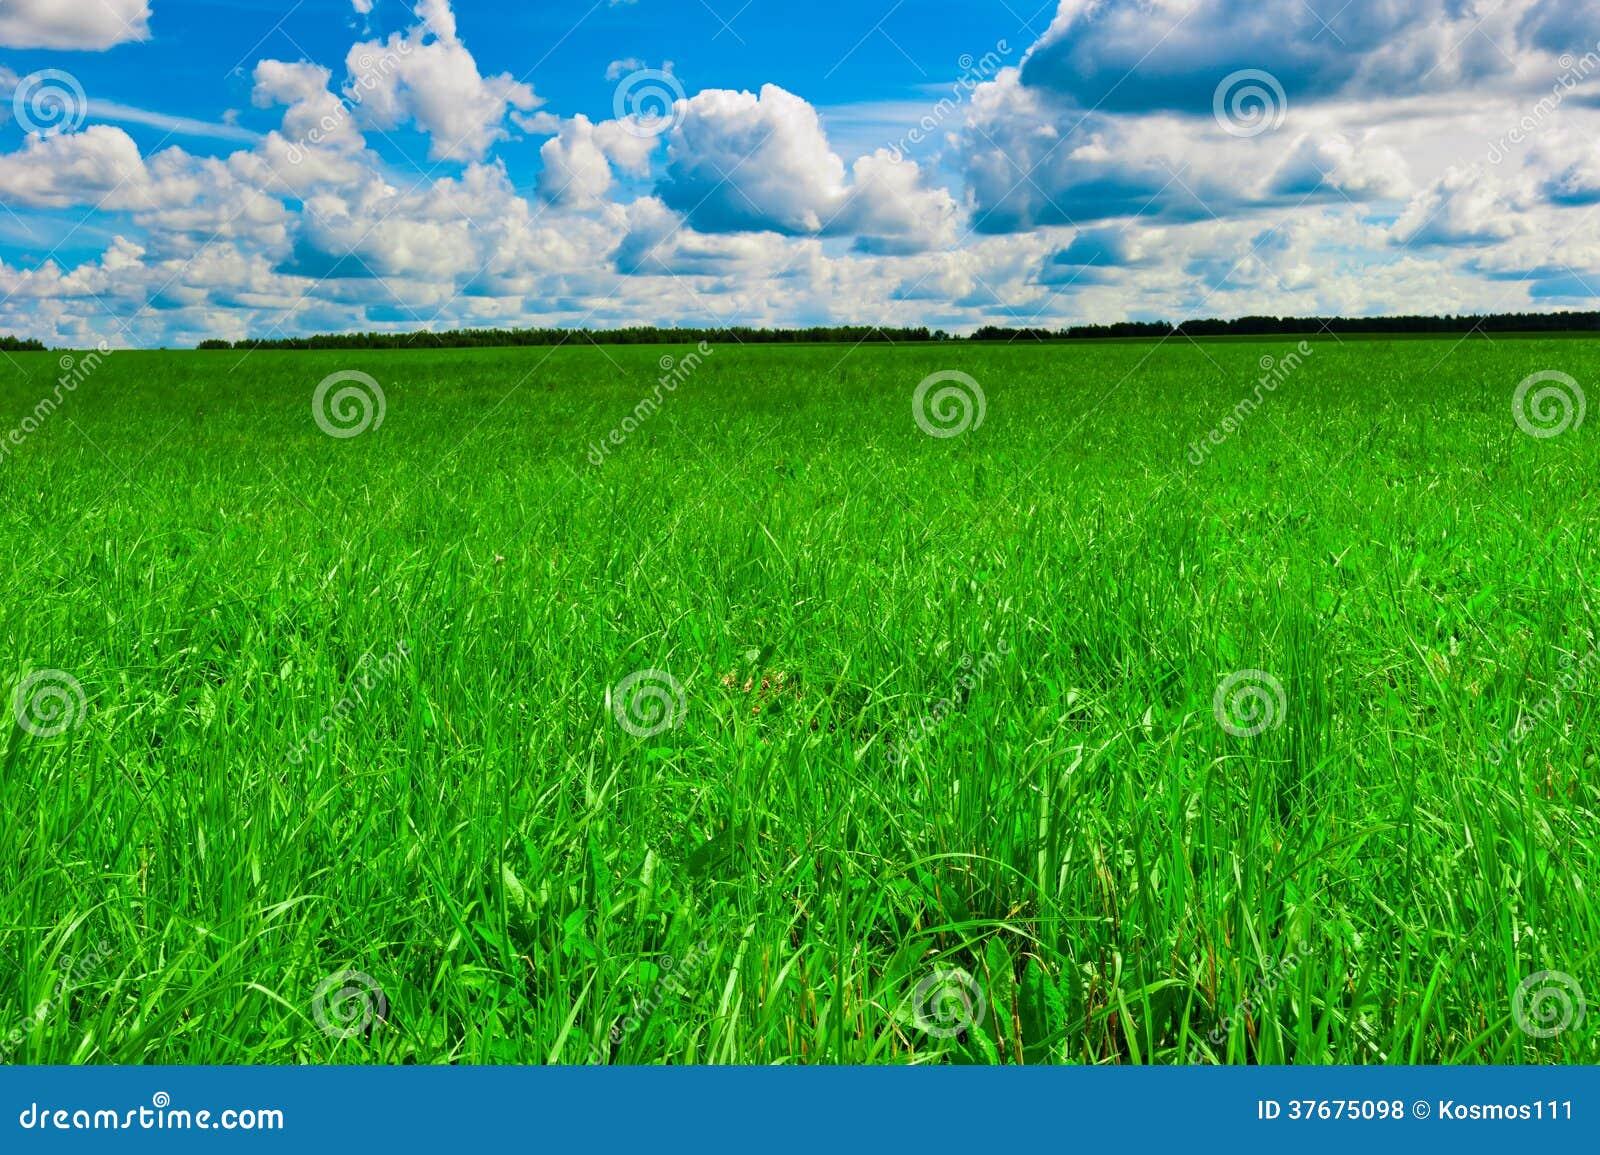 Bello prato inglese verde e tempo soleggiato piacevole - Soleggiato in inglese ...